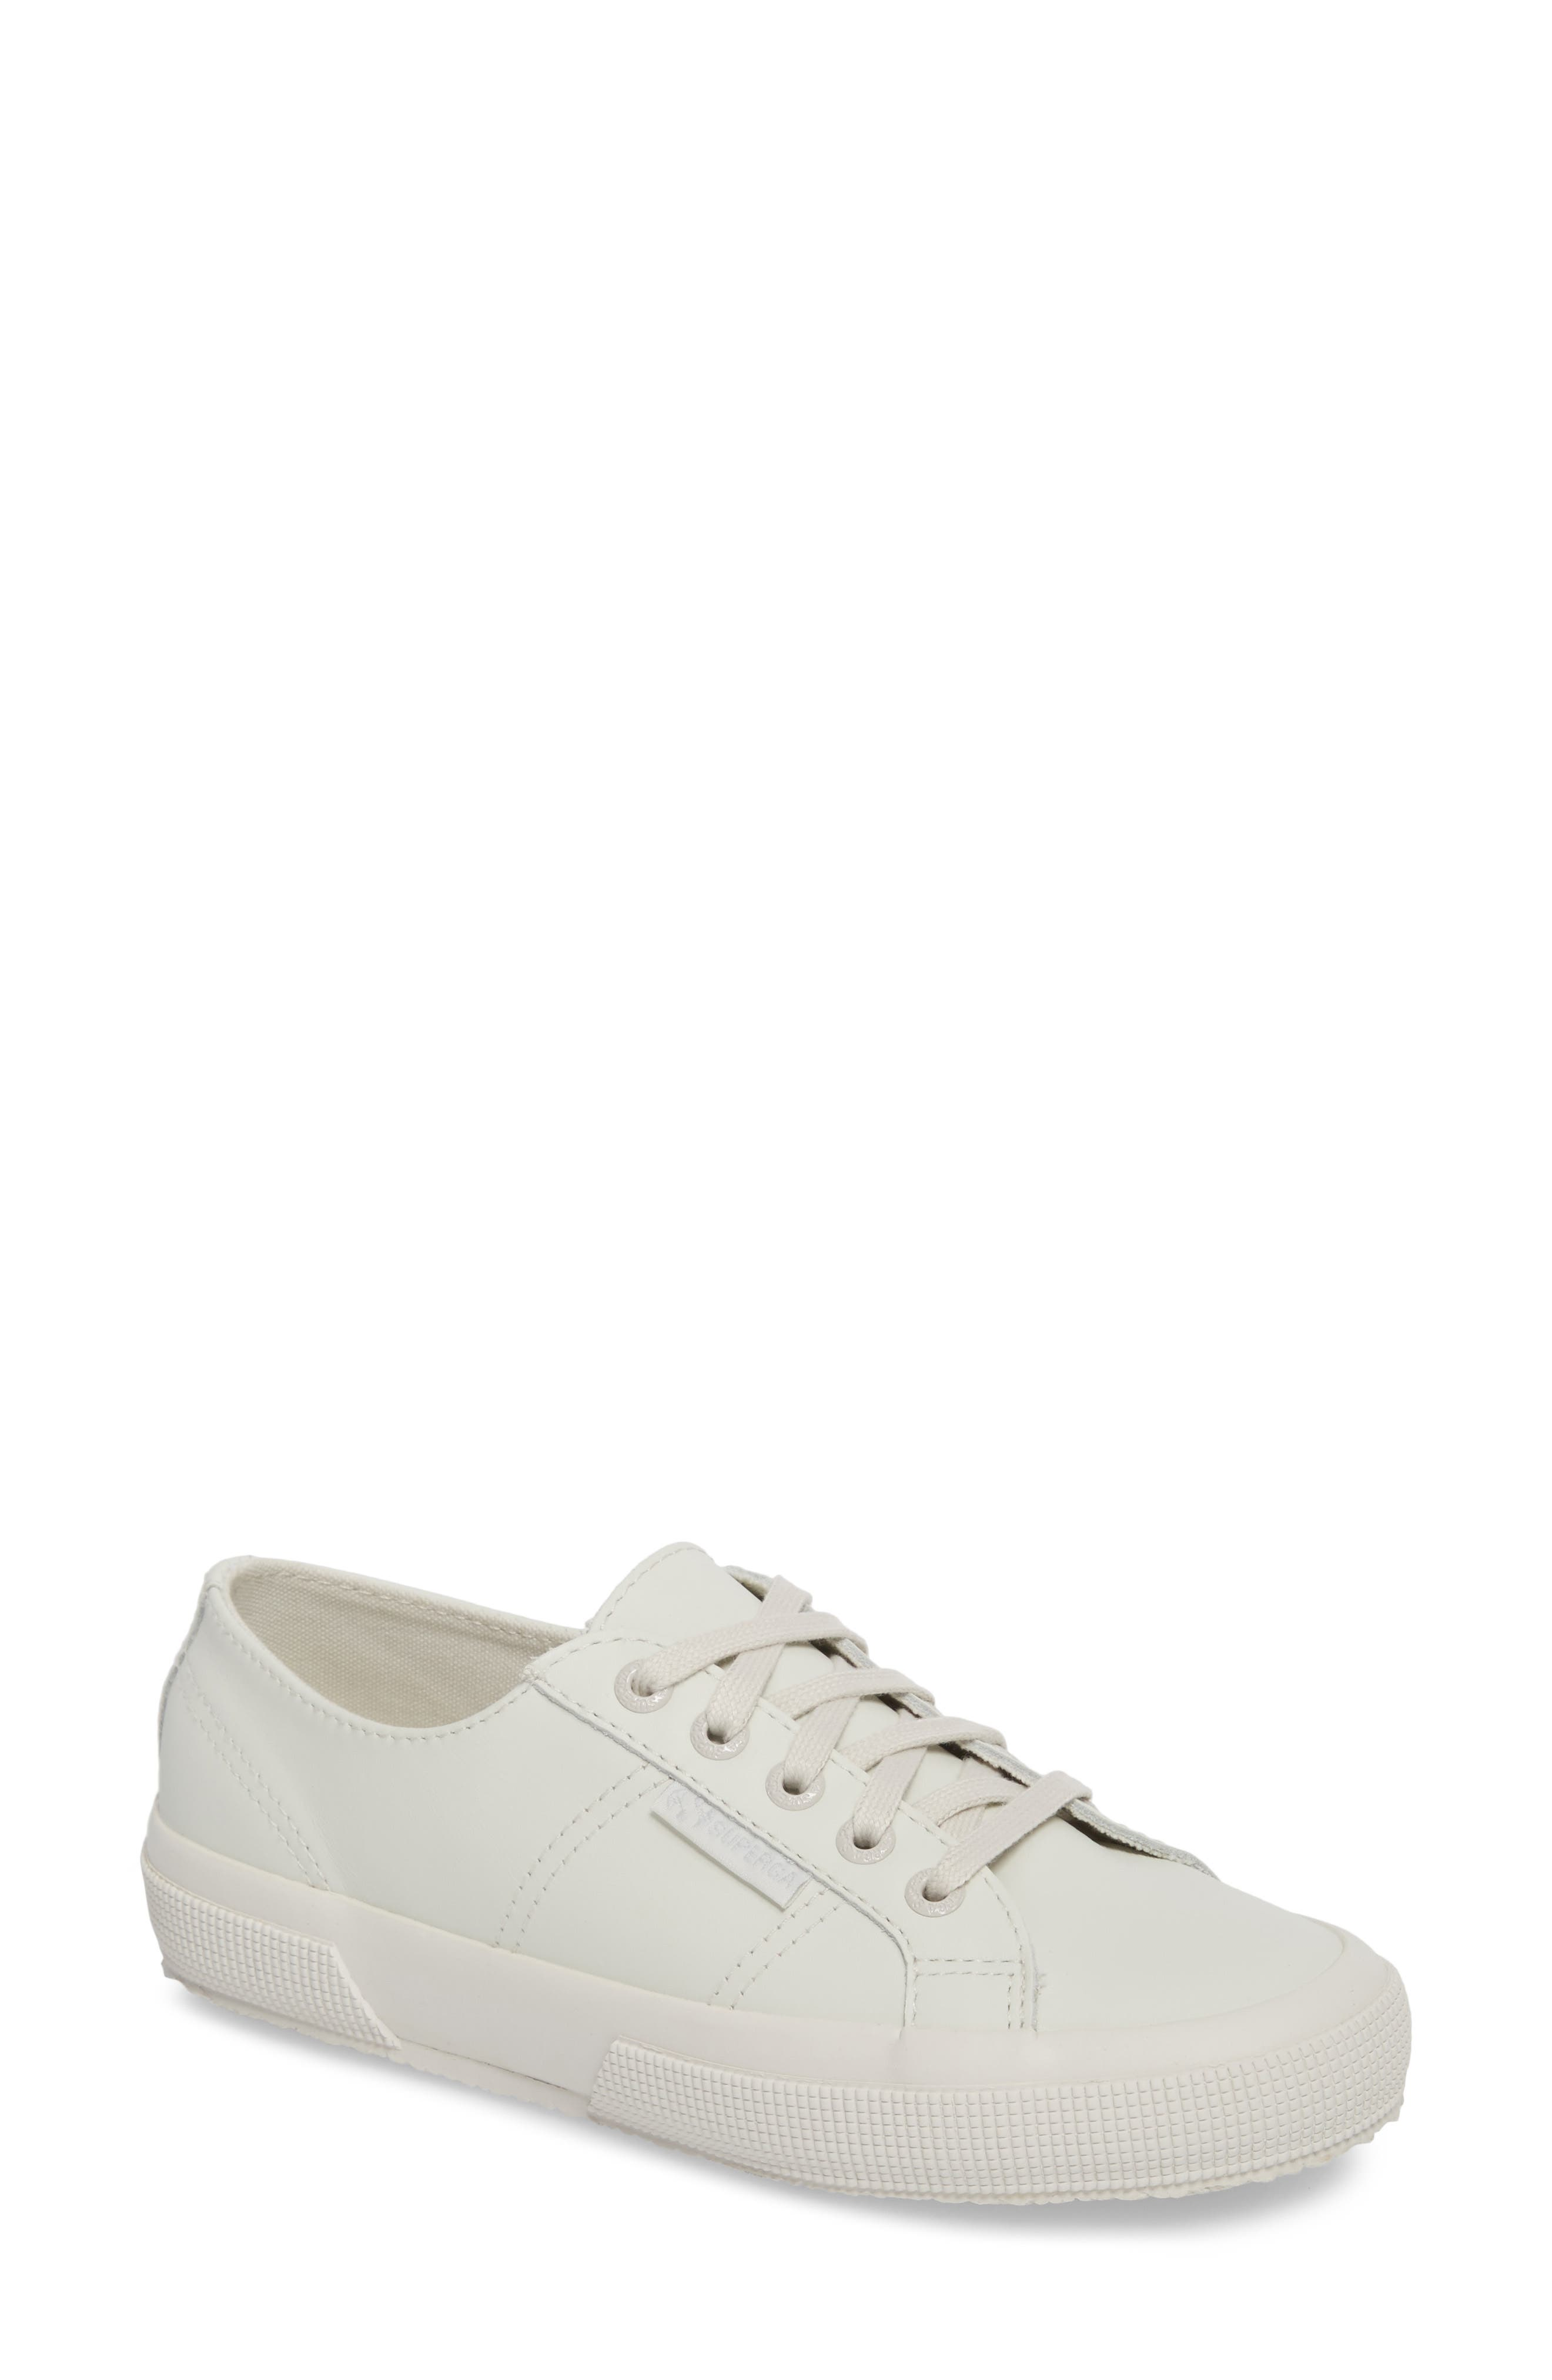 '2750' Sneaker,                             Main thumbnail 1, color,                             Ice